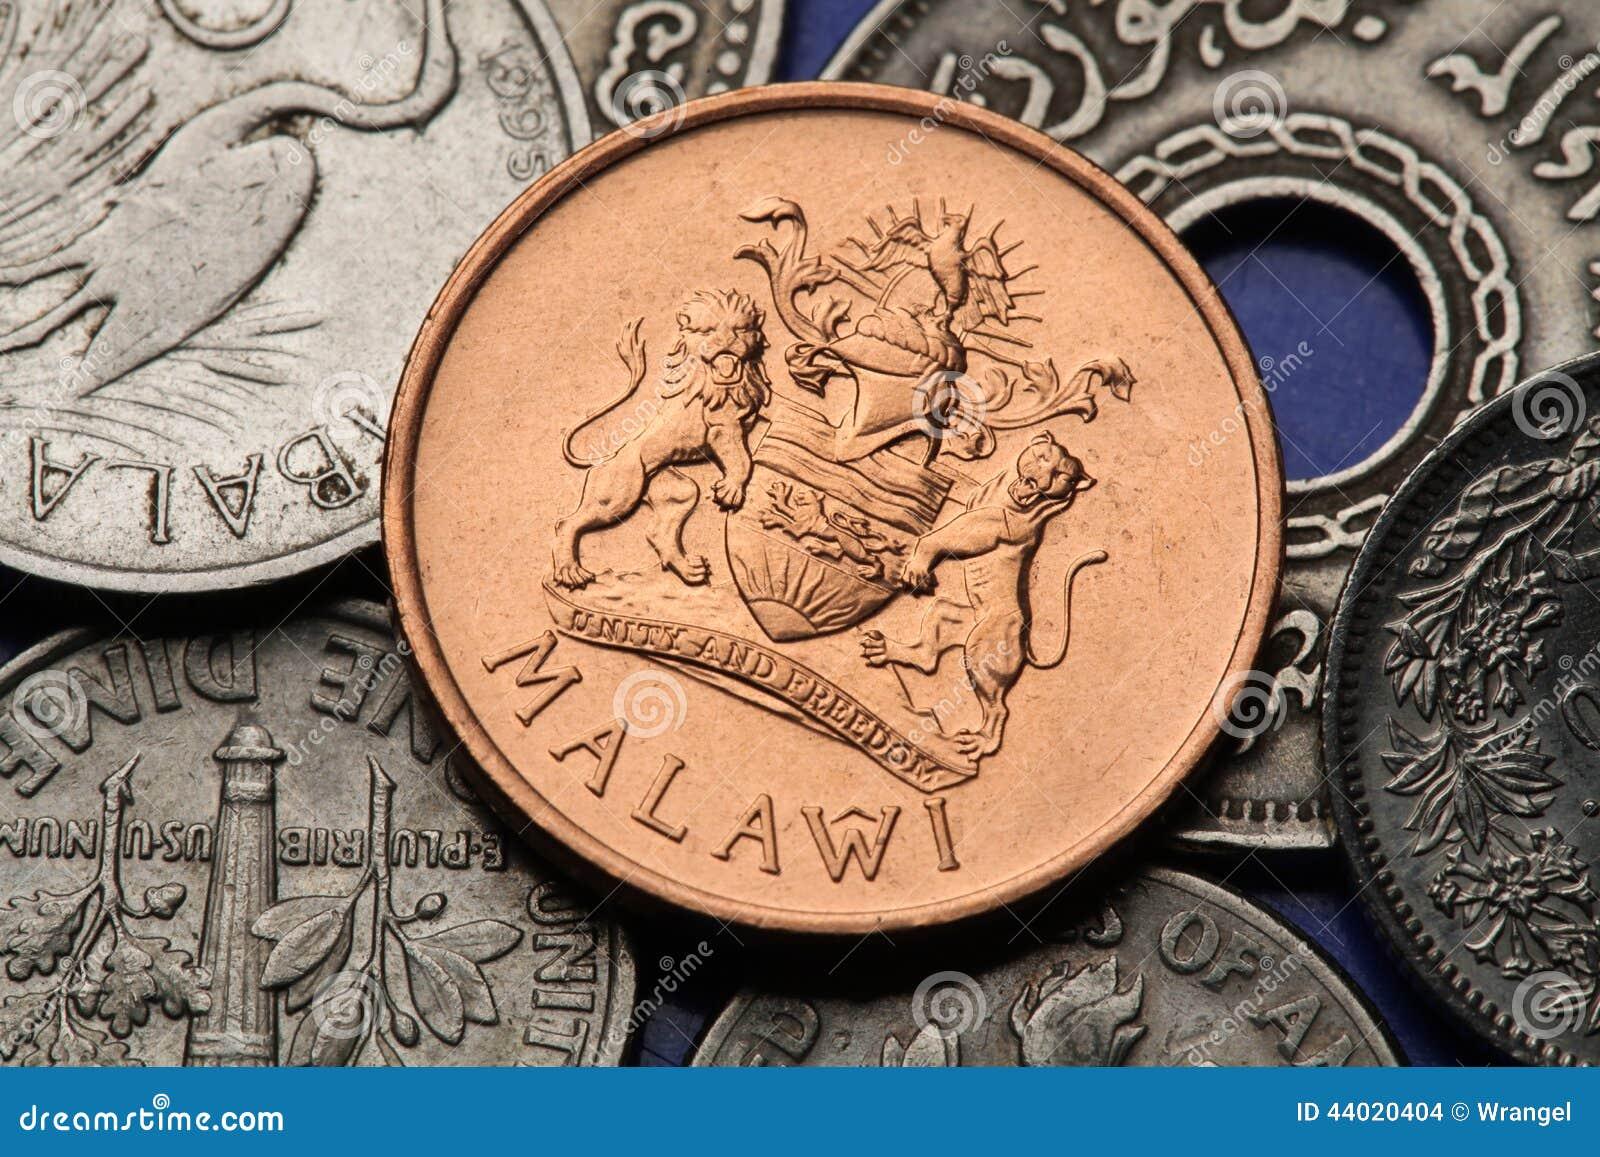 Monedas de Malawi